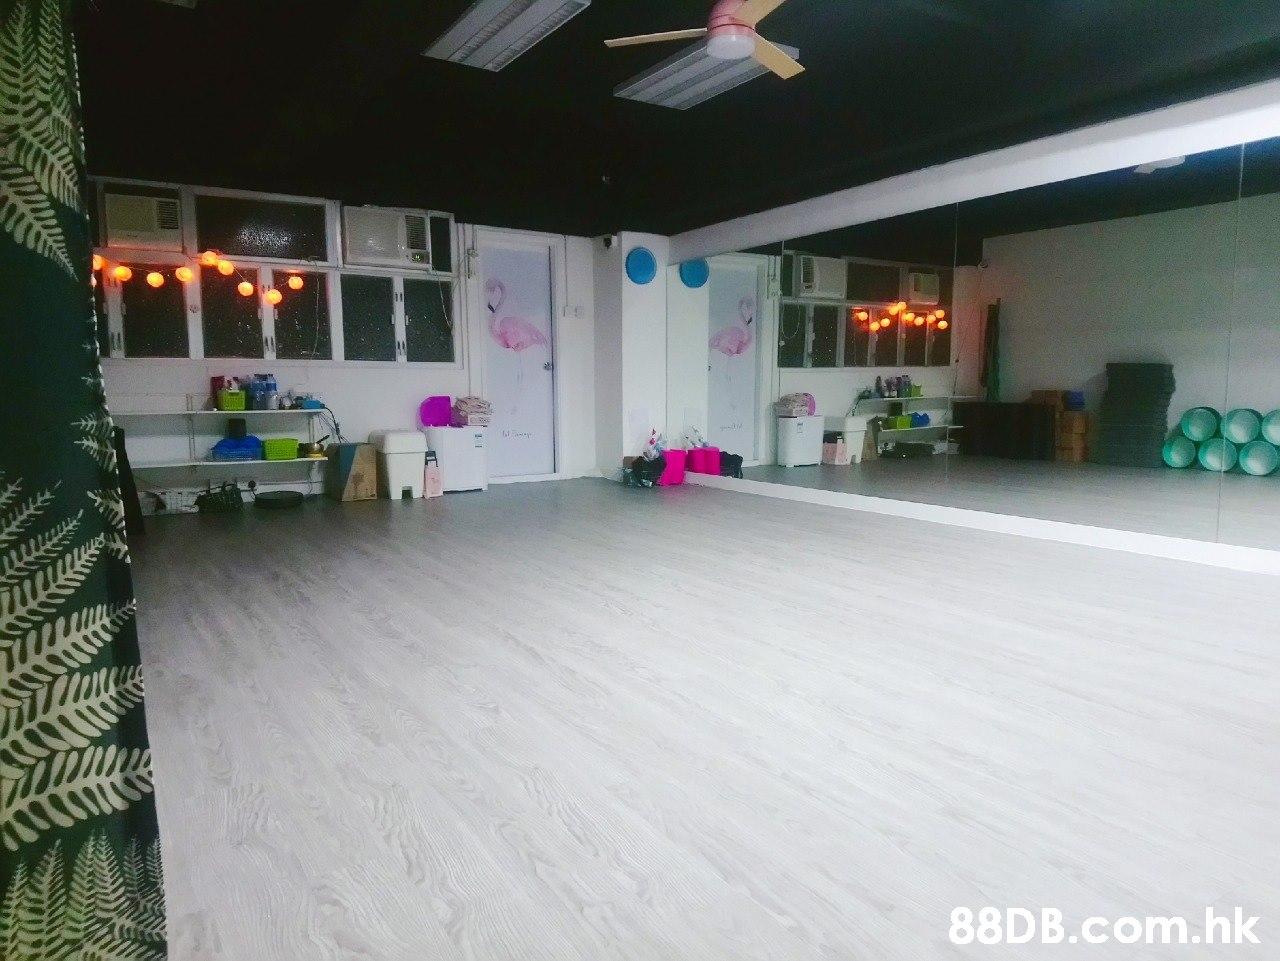 .hk  Floor,Property,Flooring,Building,Room